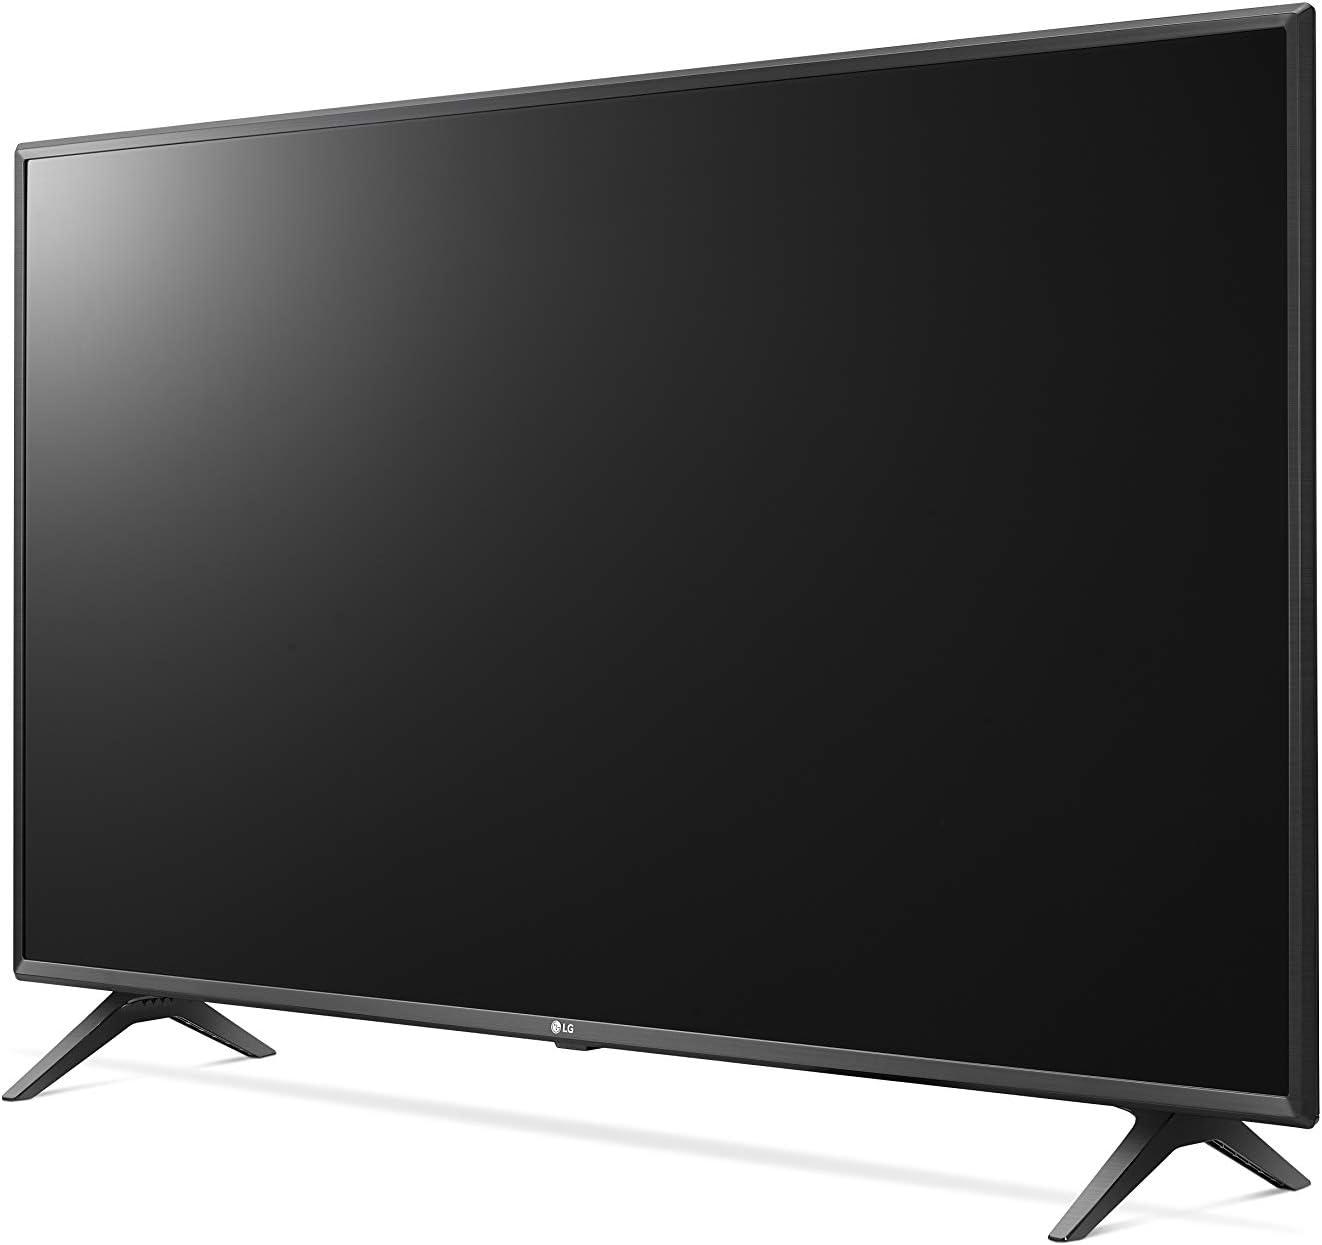 TELEVISOR 50 50UM7500 UHD STV IPS IA MAGICR DTS.VIRTX LG Works ...